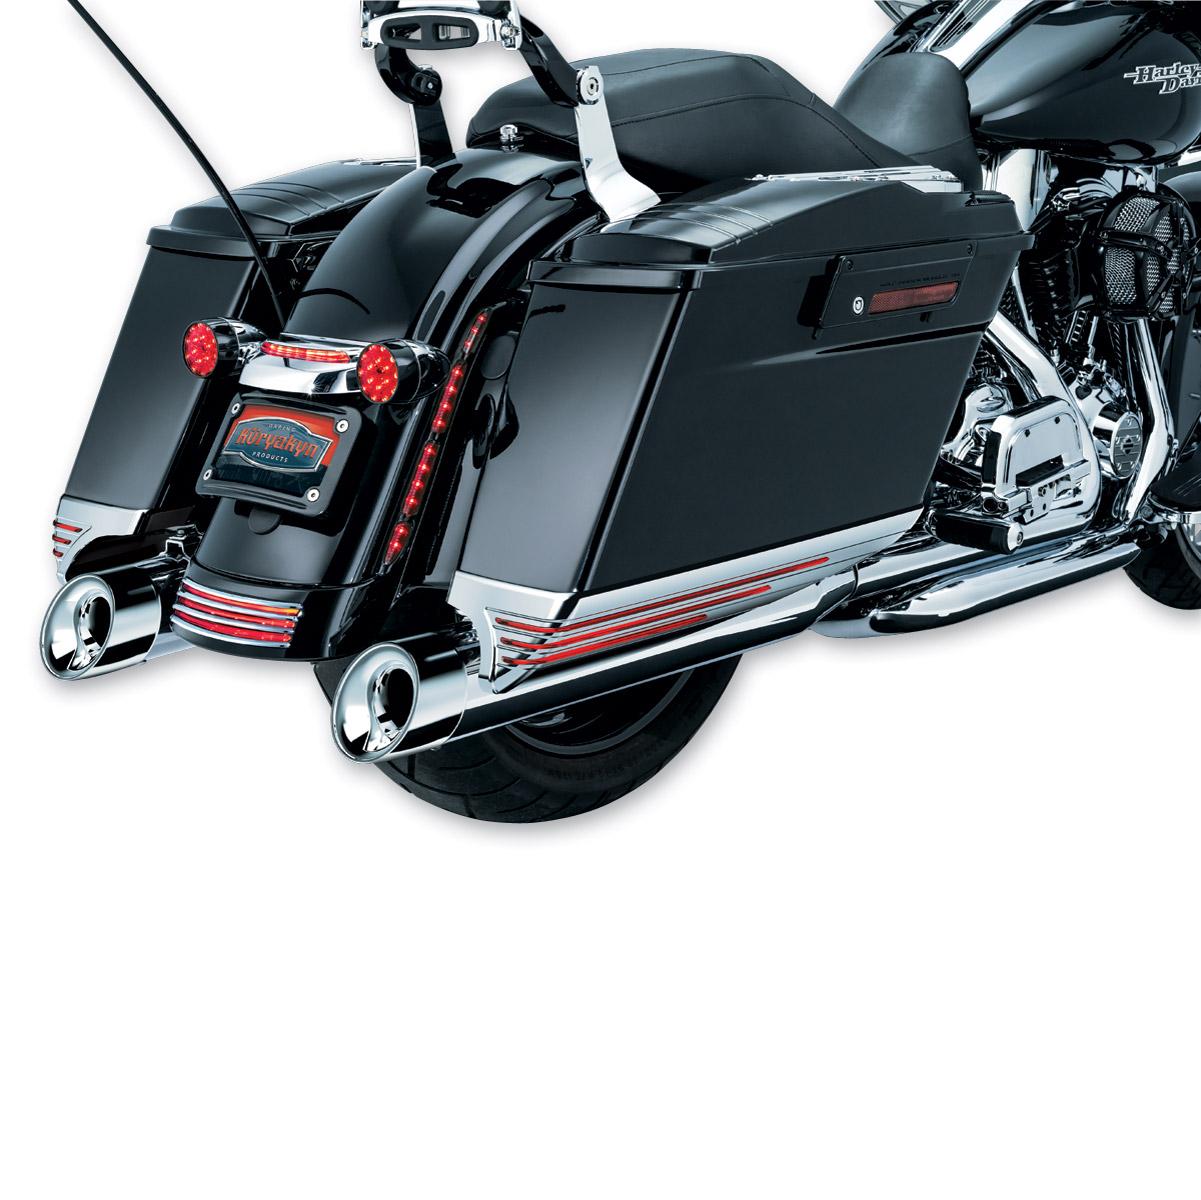 Harley-Davidson Saddlebag Extensions | J&P Cycles